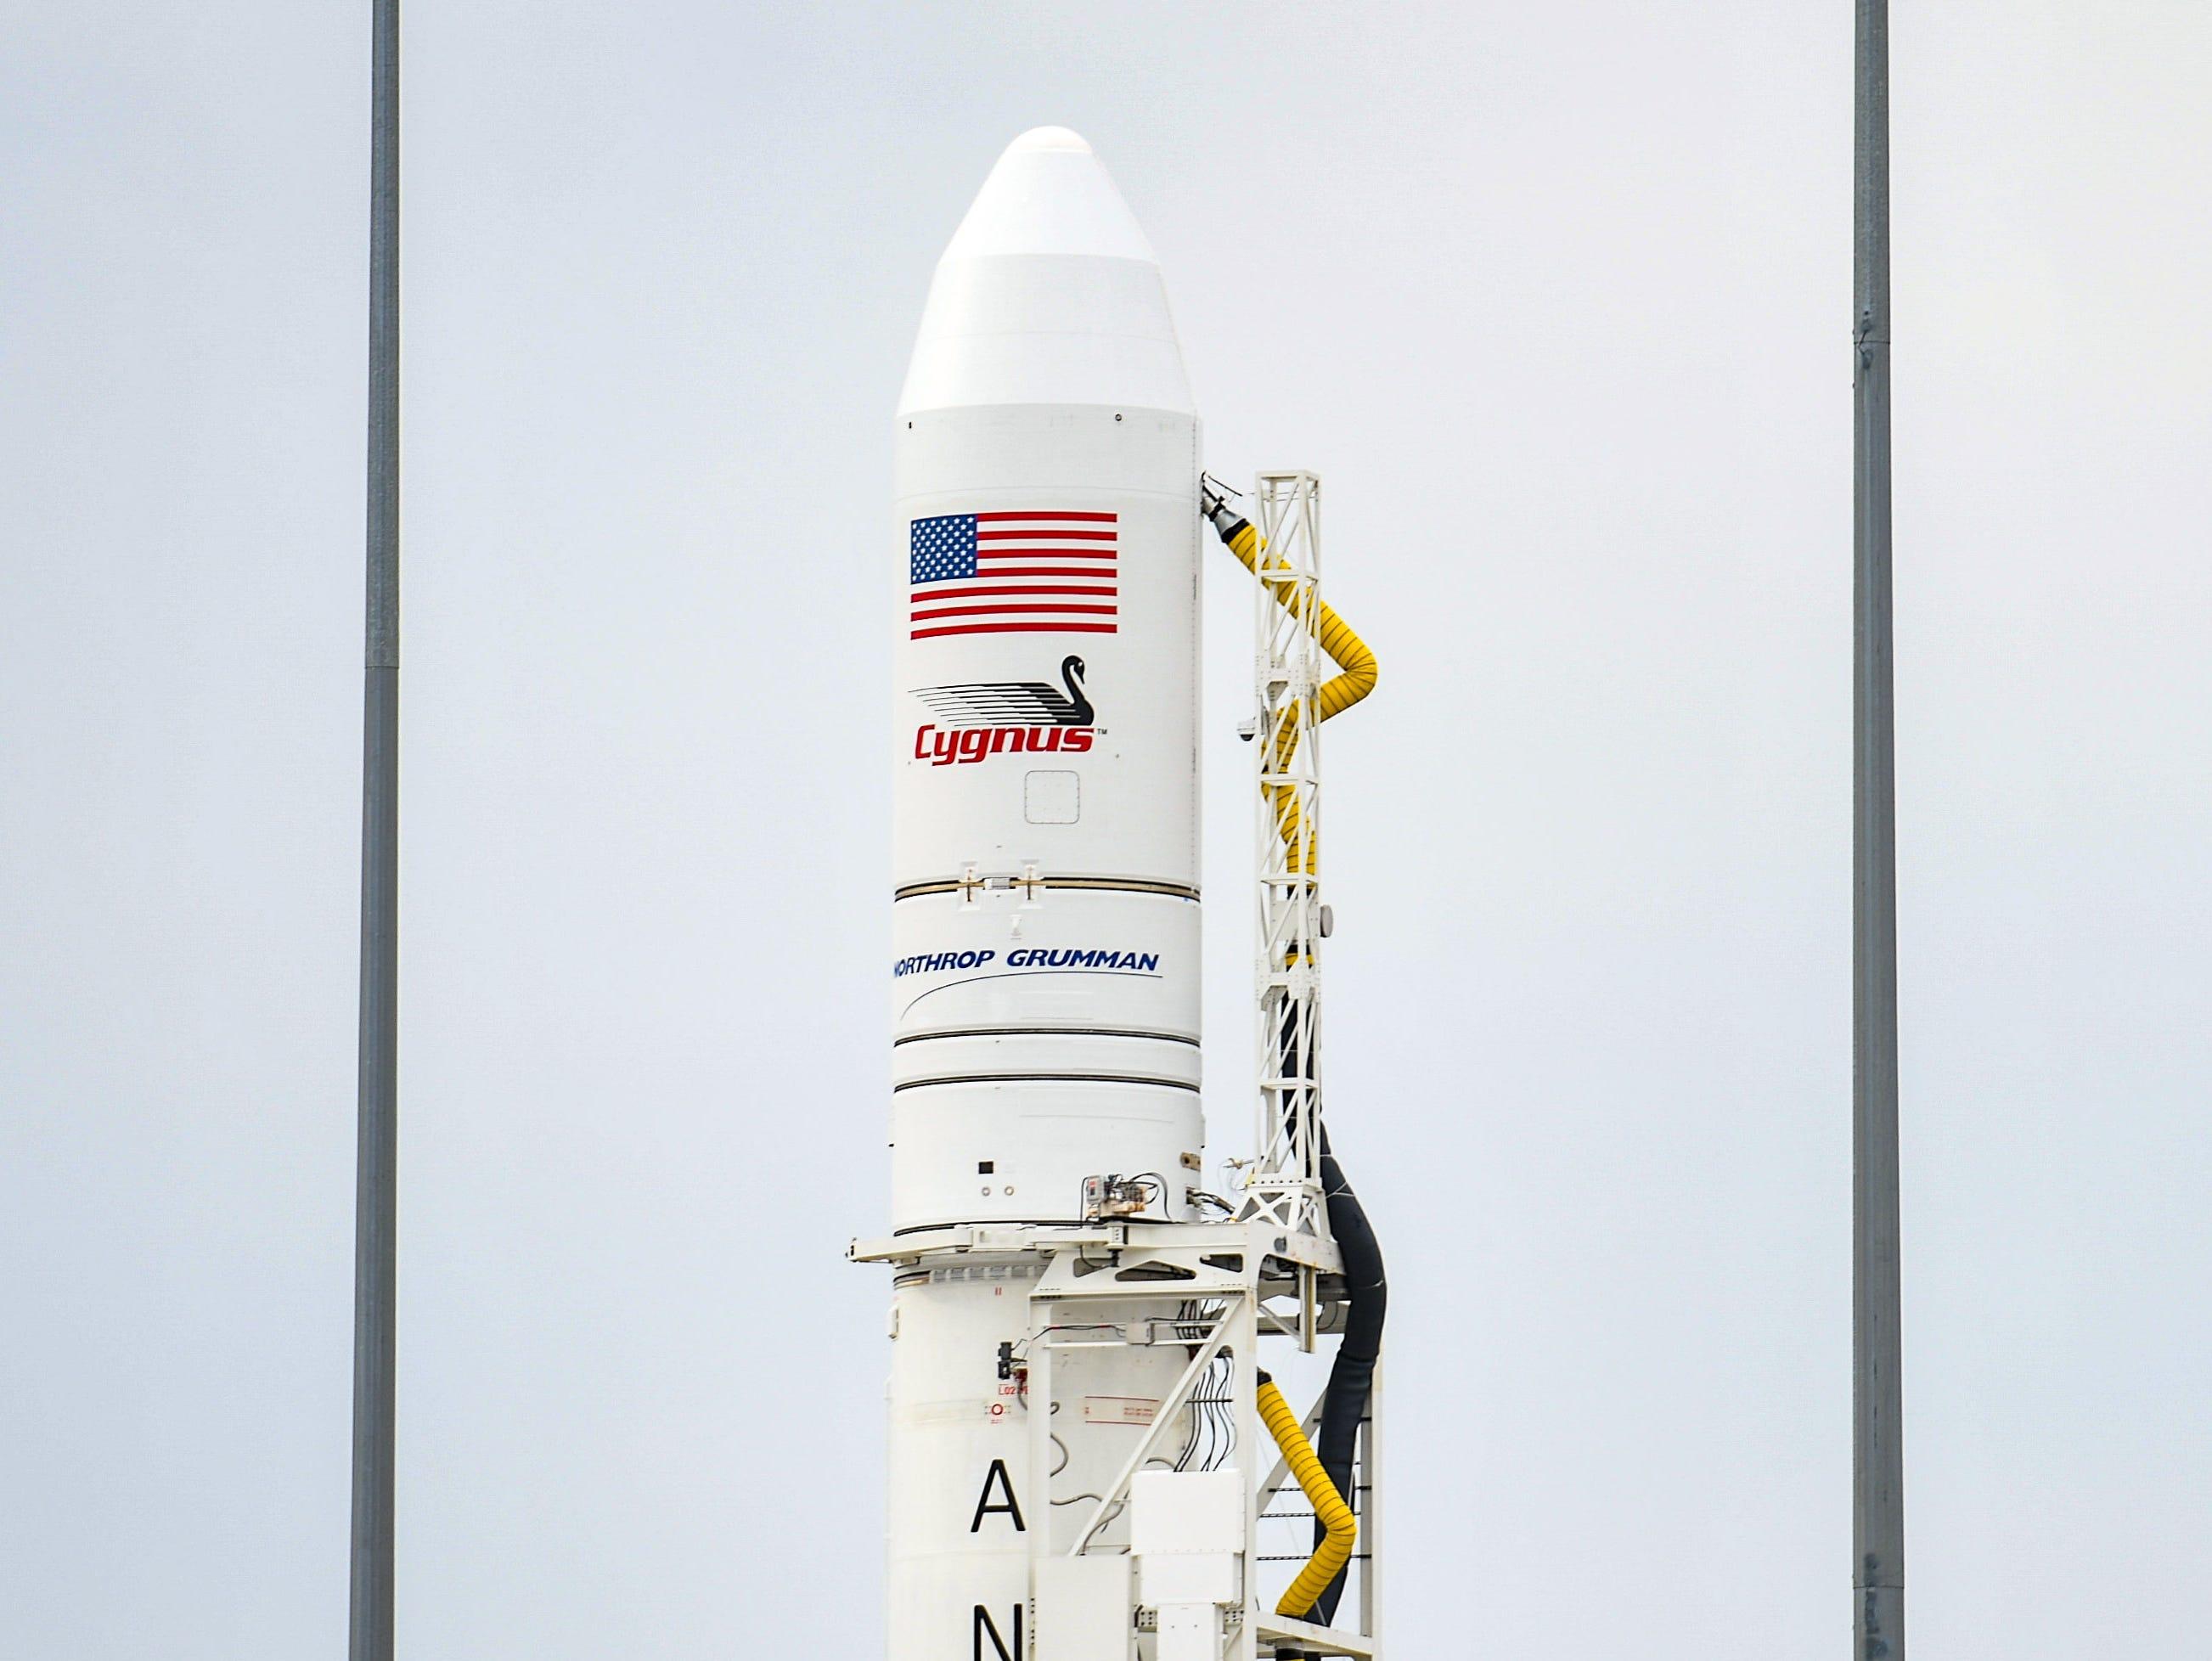 An Antares rocket sits awaiting launch at NASA's Mid-Atlantic Regional Spaceport in Wallops Island, Virginia on Wednesday, Nov 14, 2018.